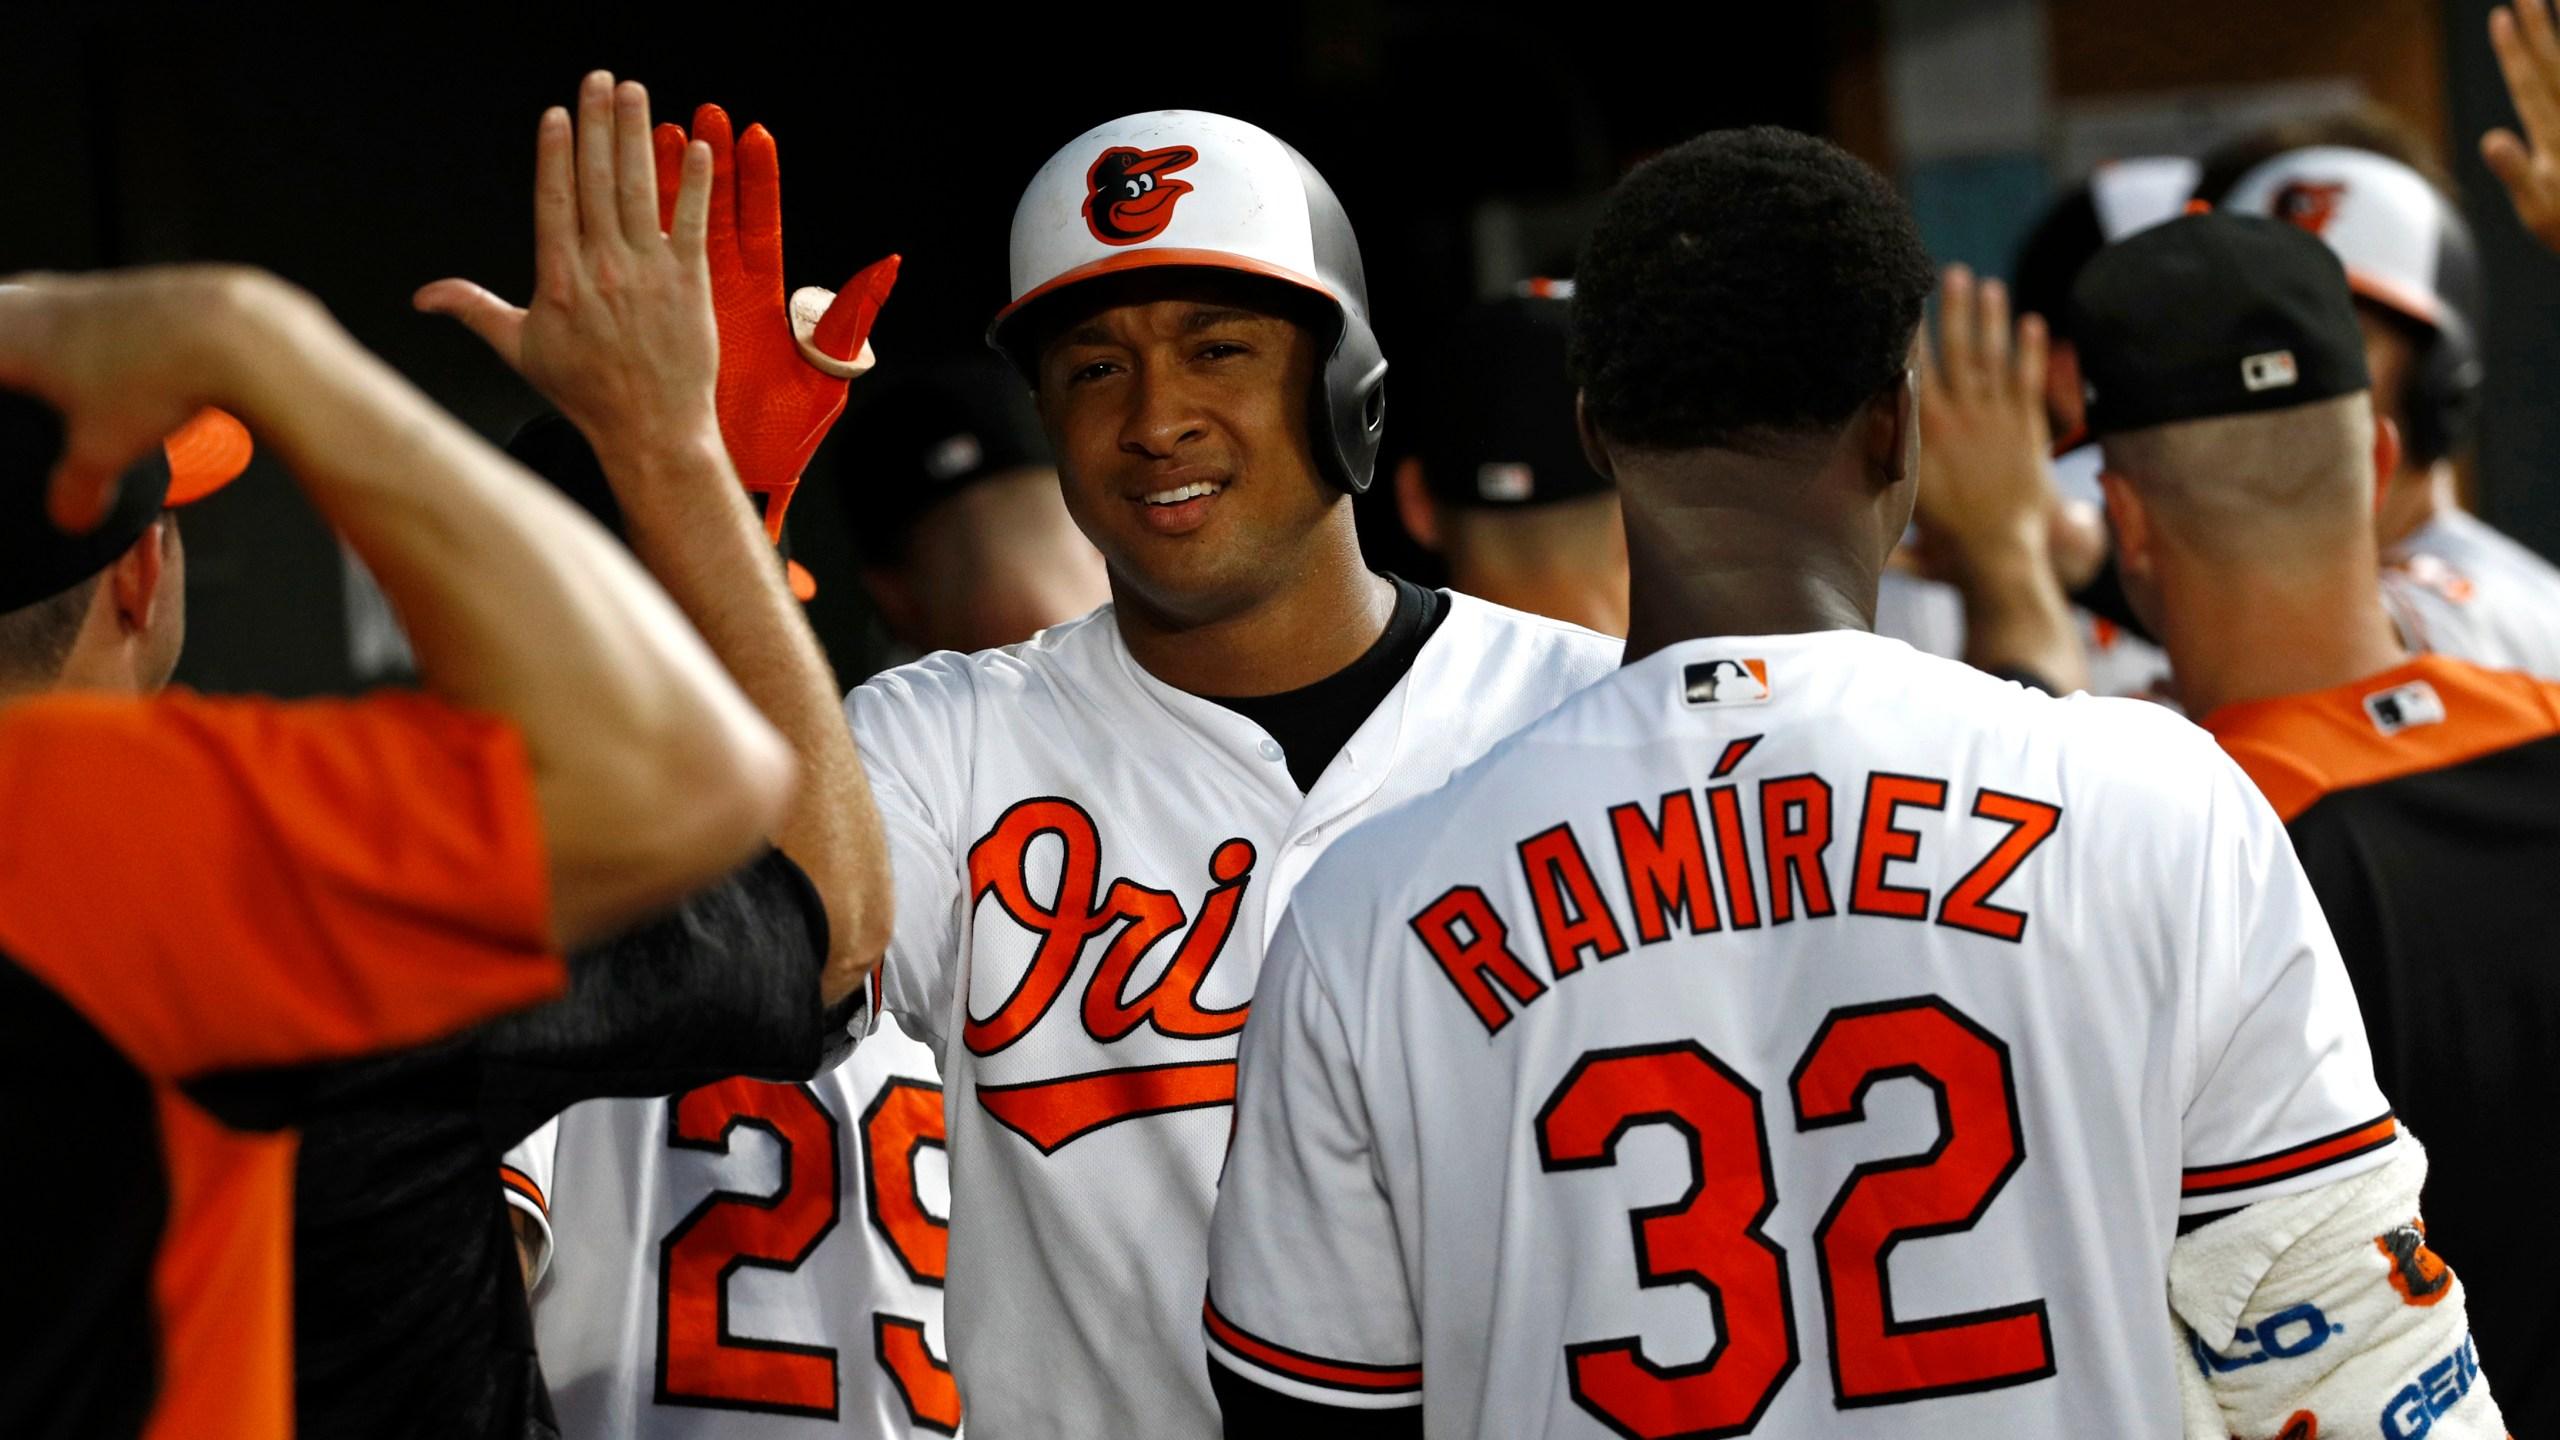 Red Sox Orioles Baseball_1533080925151